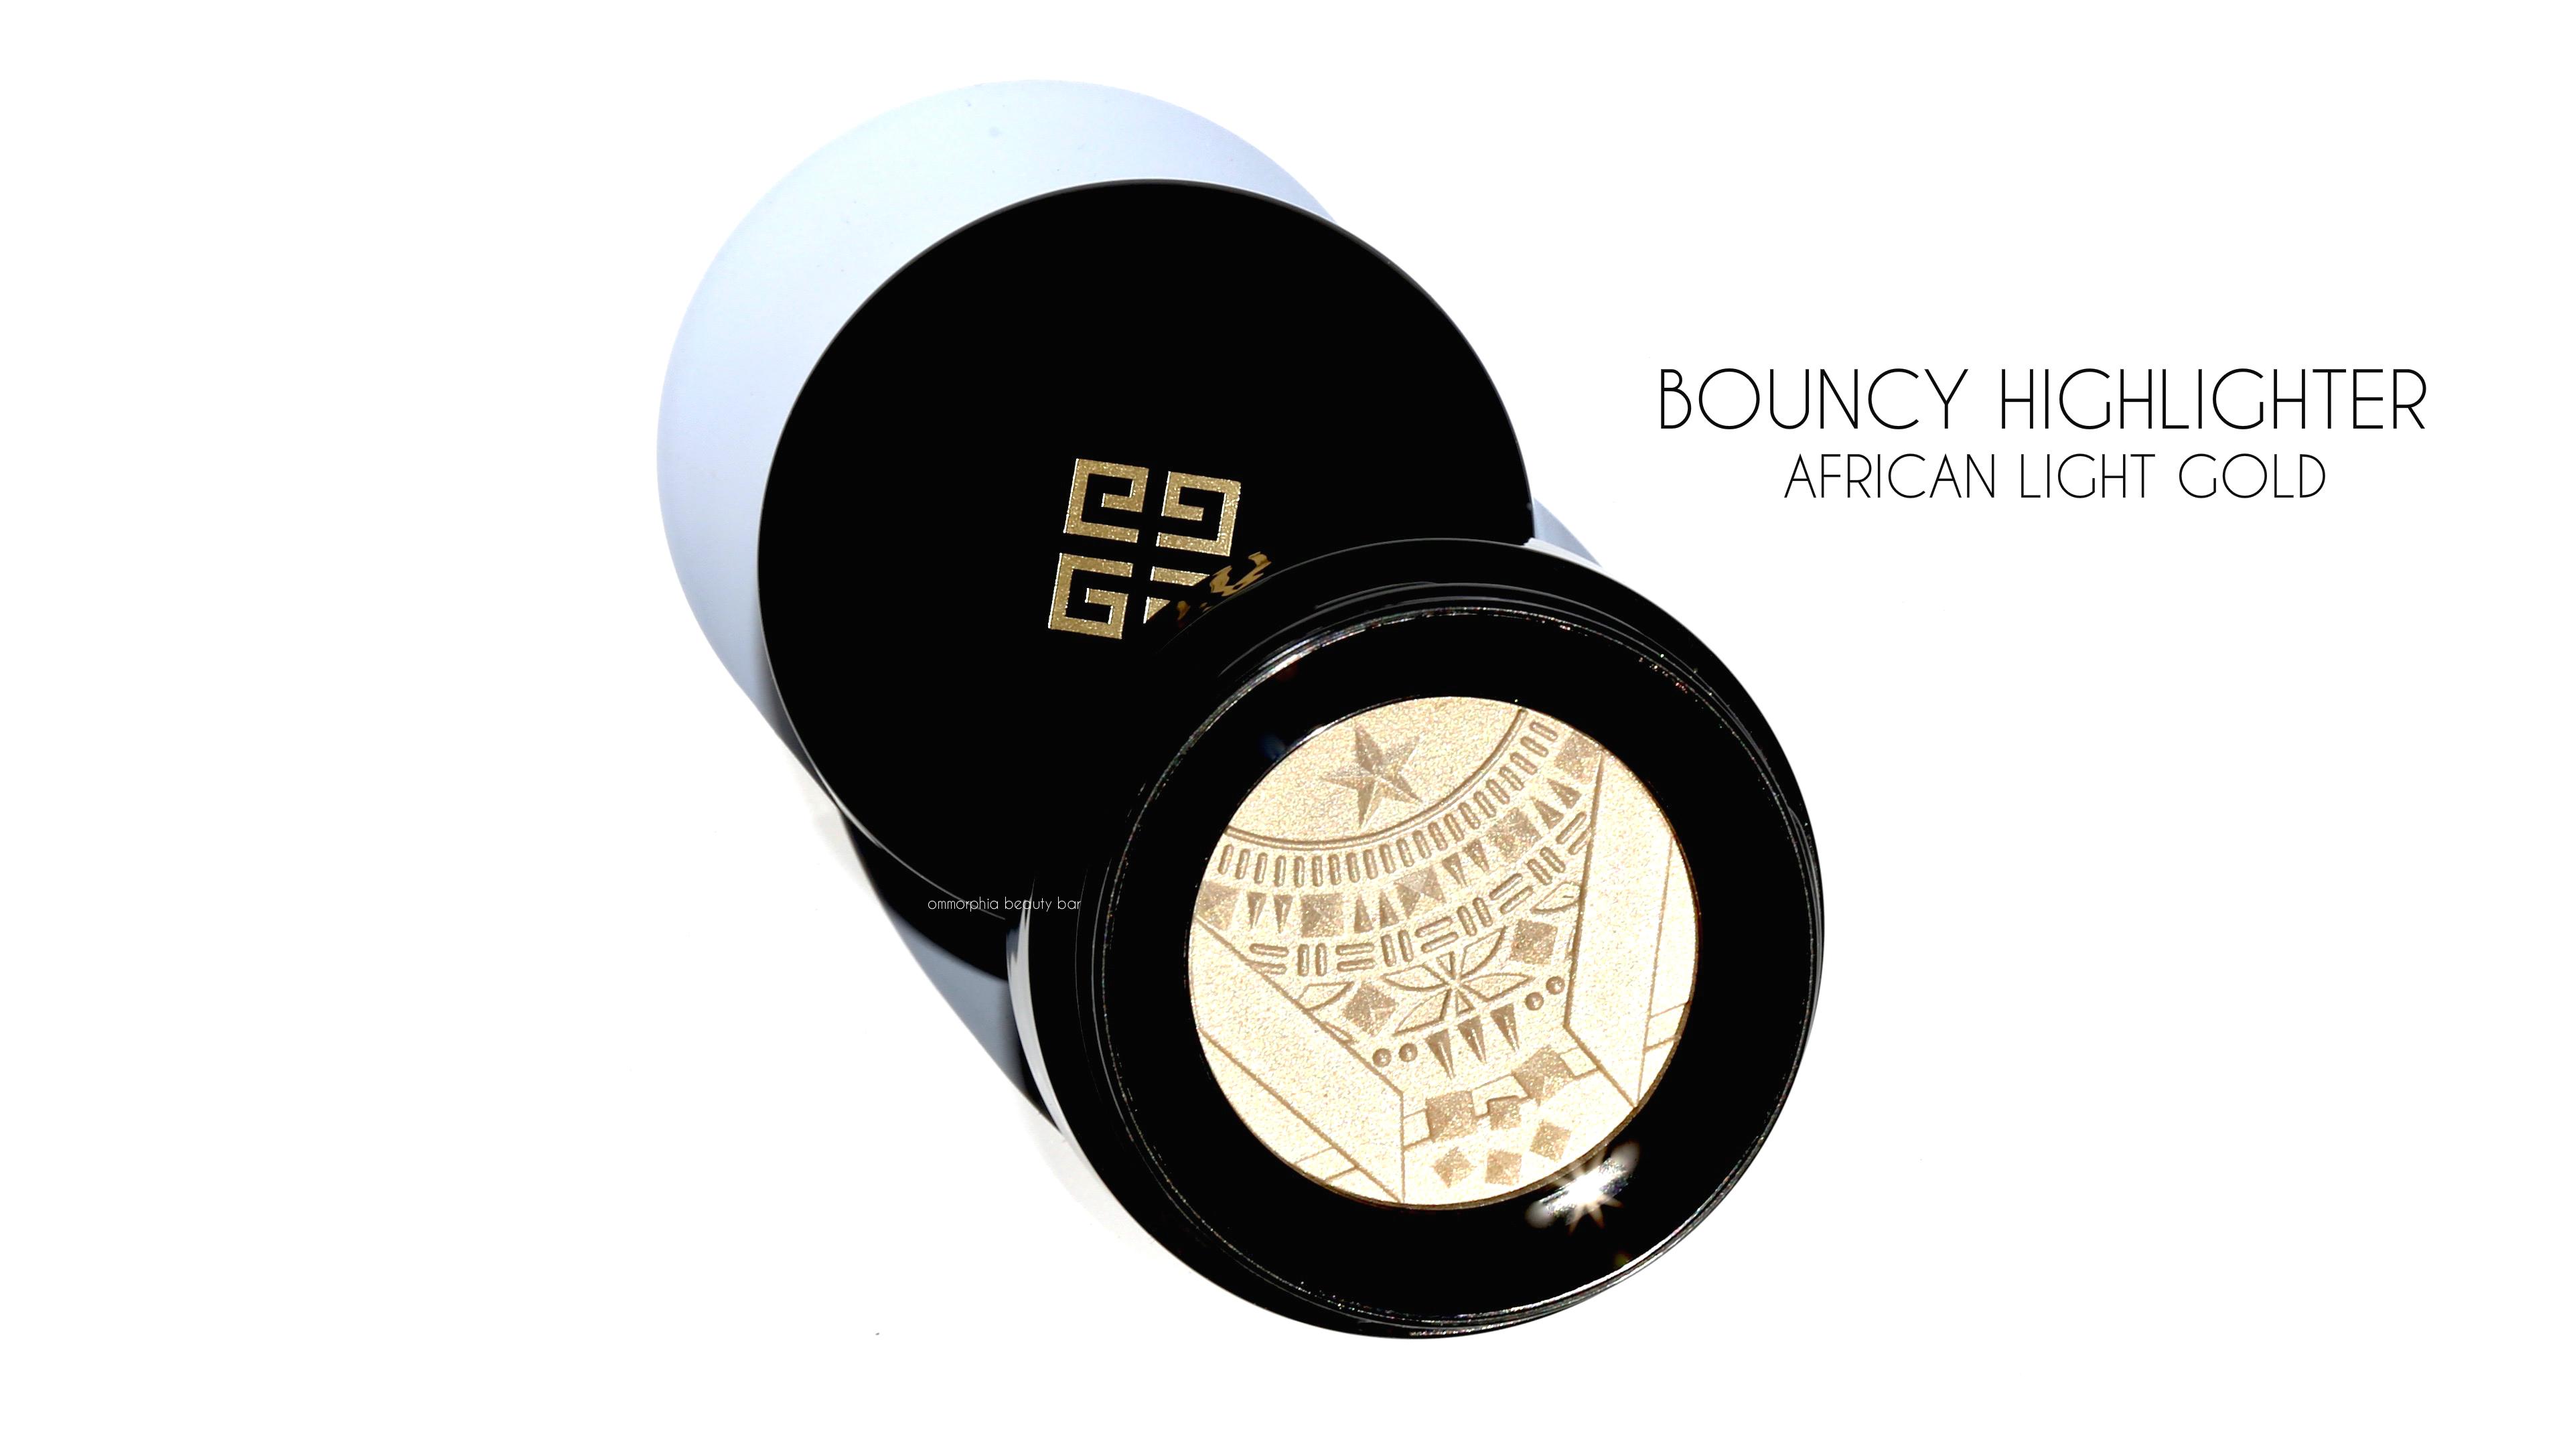 Bouncy Highlighter African Light Gold 00a716ee4ad6e